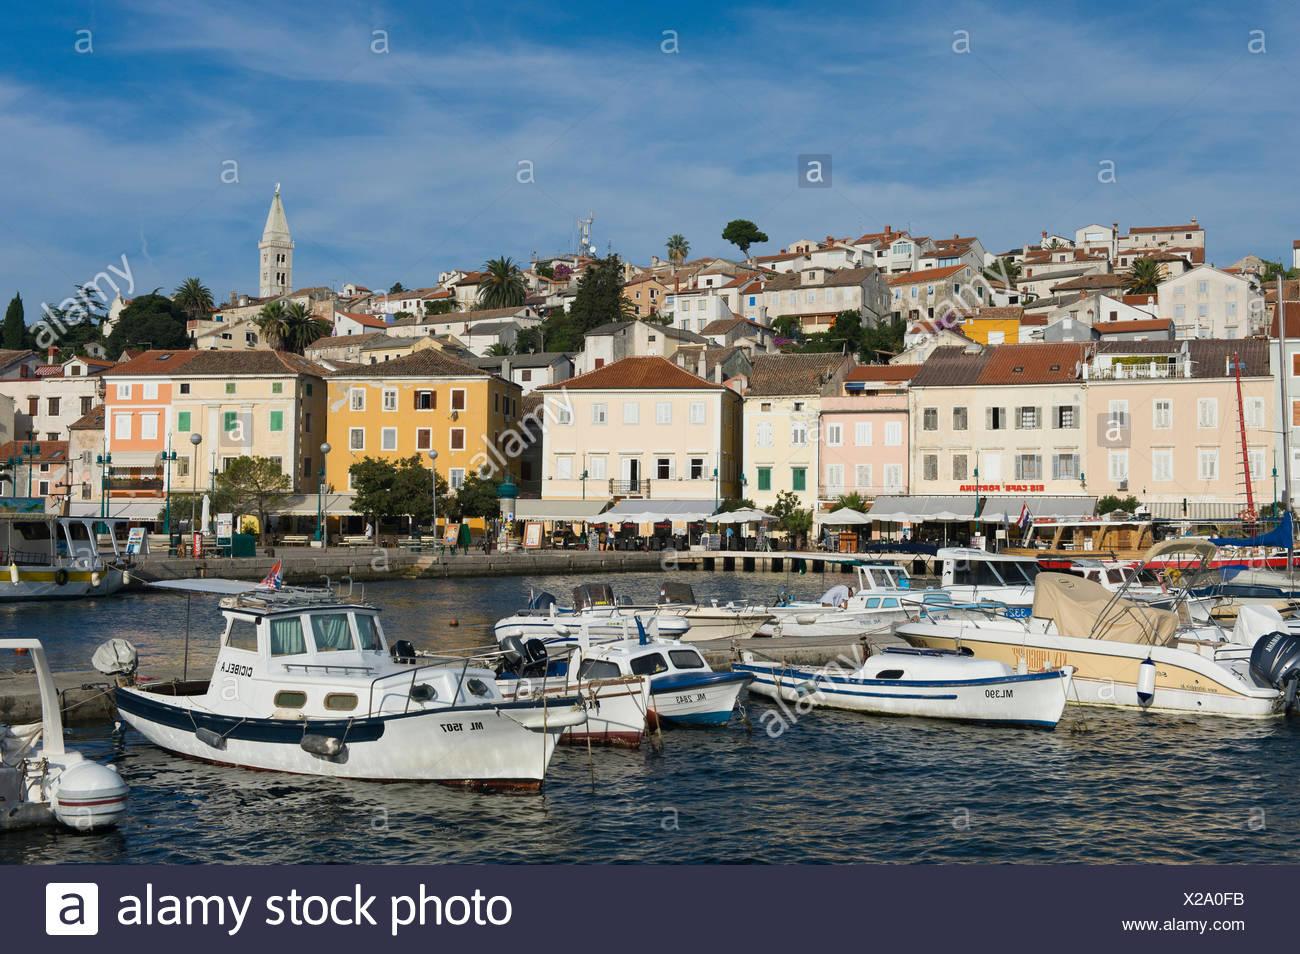 Boats in the harbour of Mali Losinj, Losinj Island, Adriatic Sea, Kvarner Gulf, Croatia, Europe Stock Photo